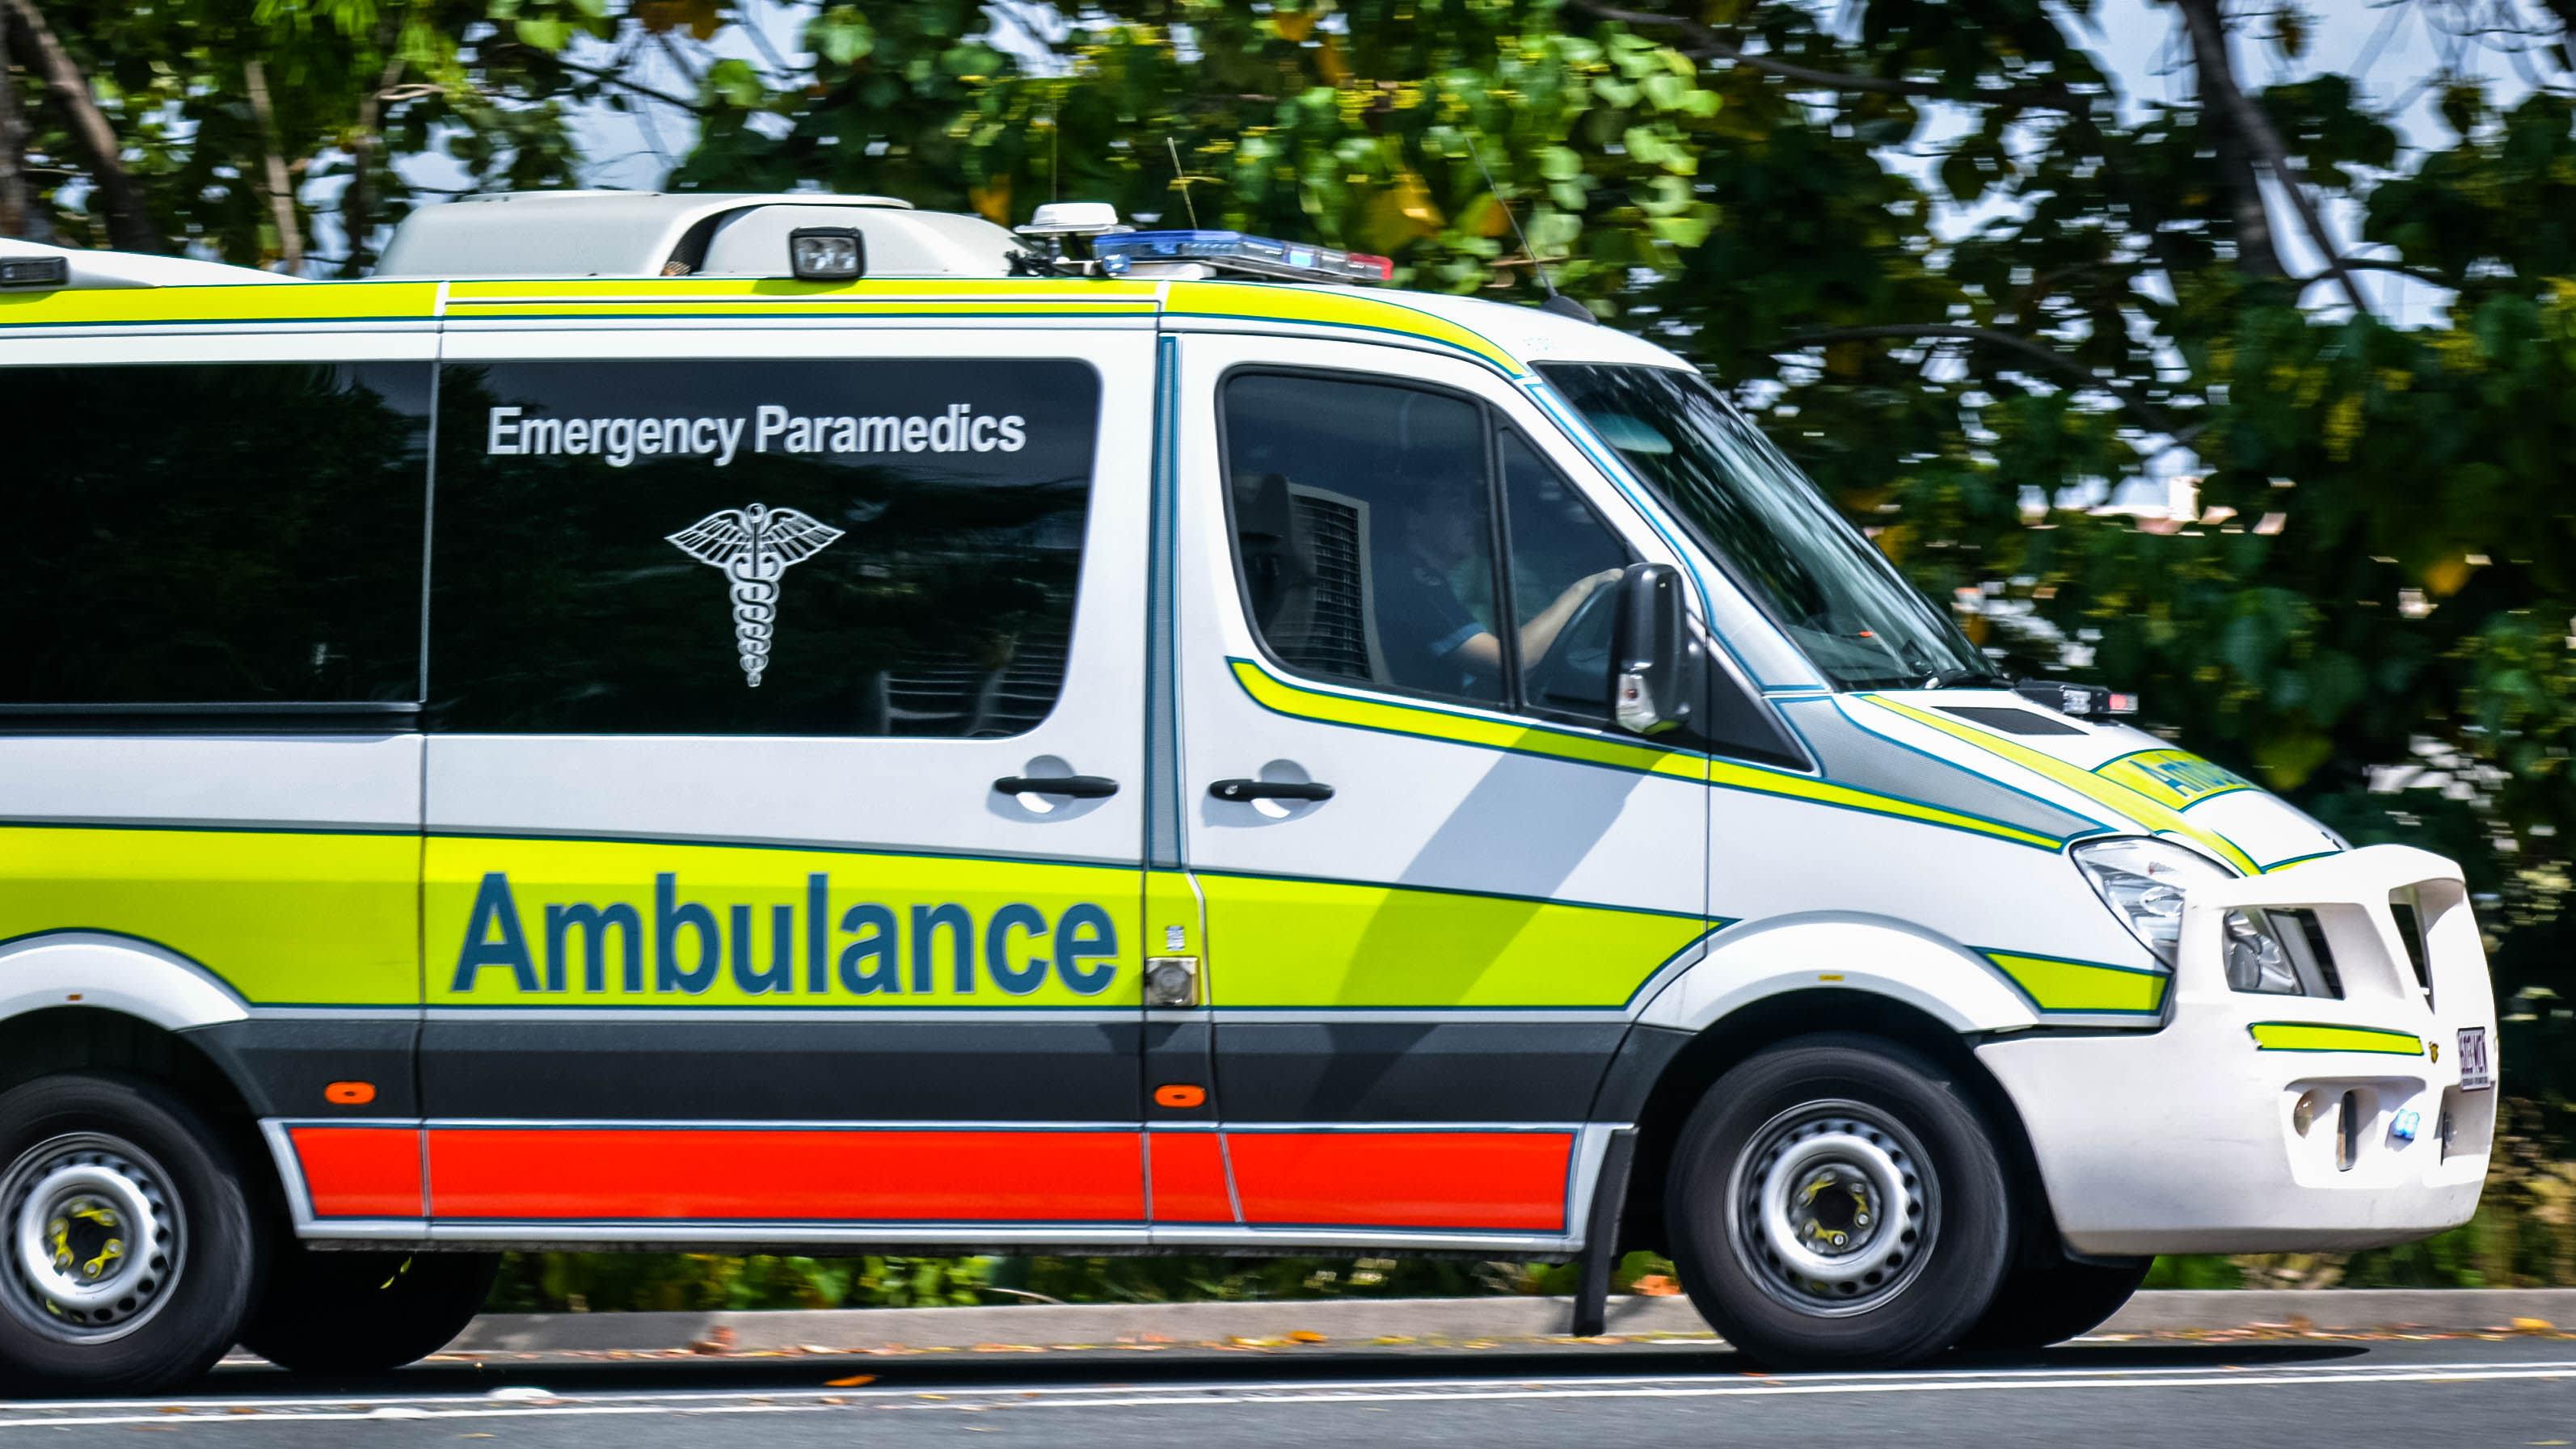 Happy Ambulance Day